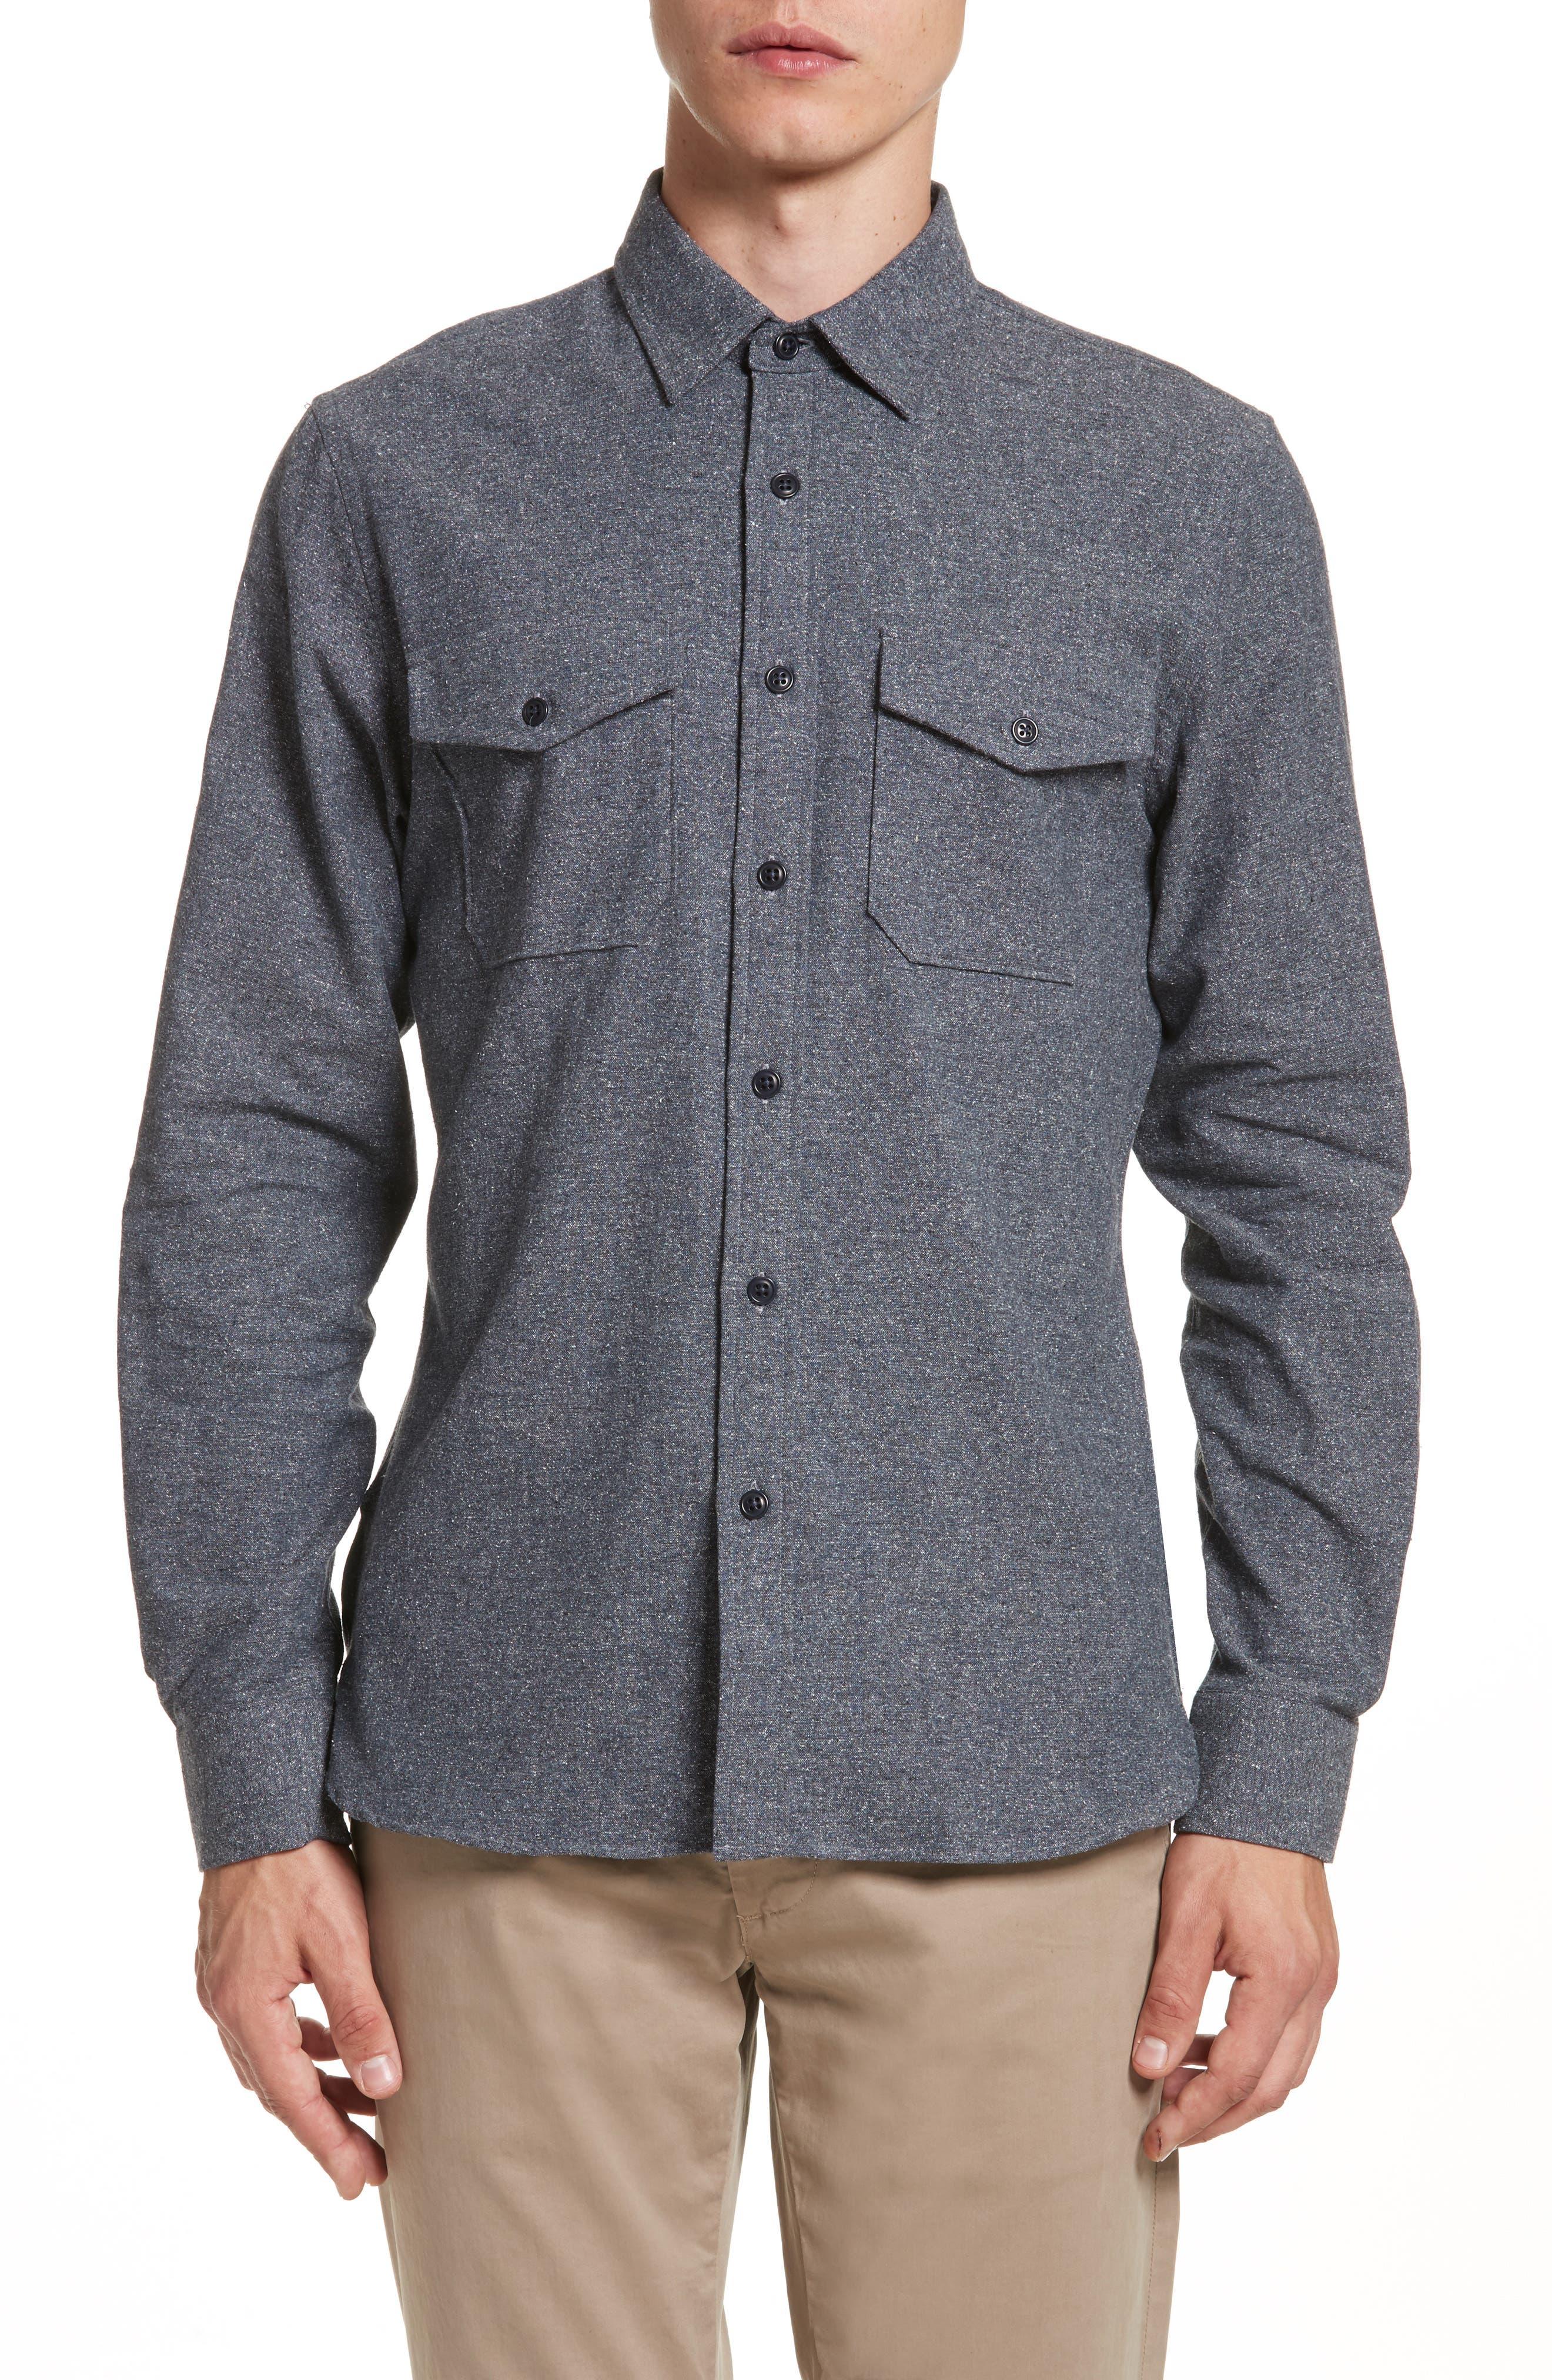 Main Image - Todd Snyder Silk Blend Speckled Work Shirt